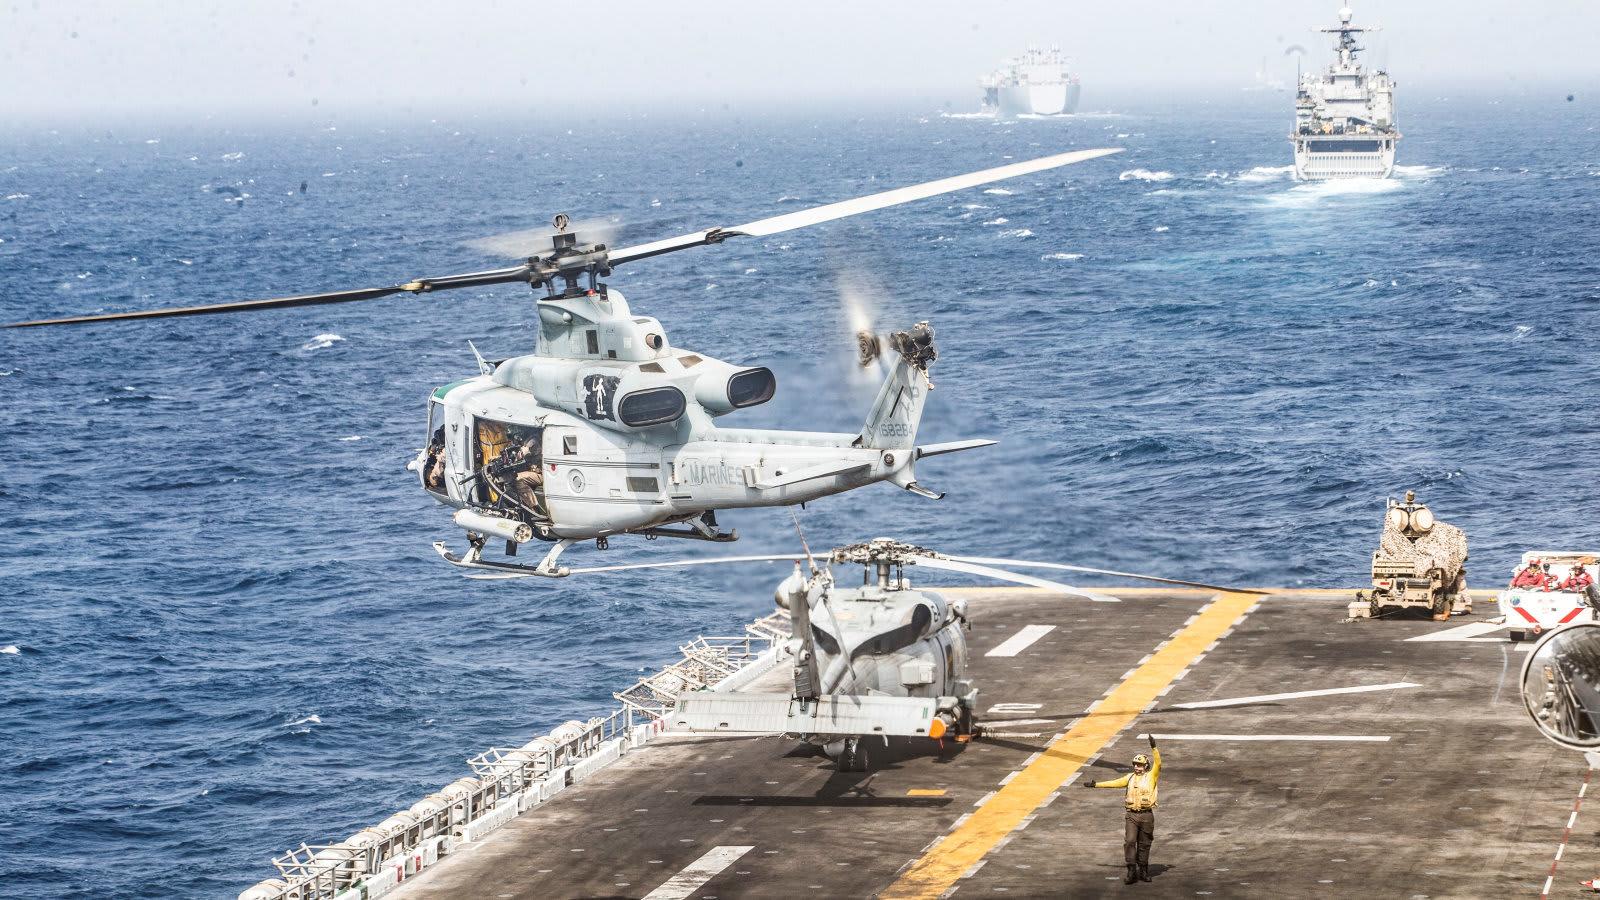 Dalton Swanbeck/U.S. Navy/Handout via Reuters